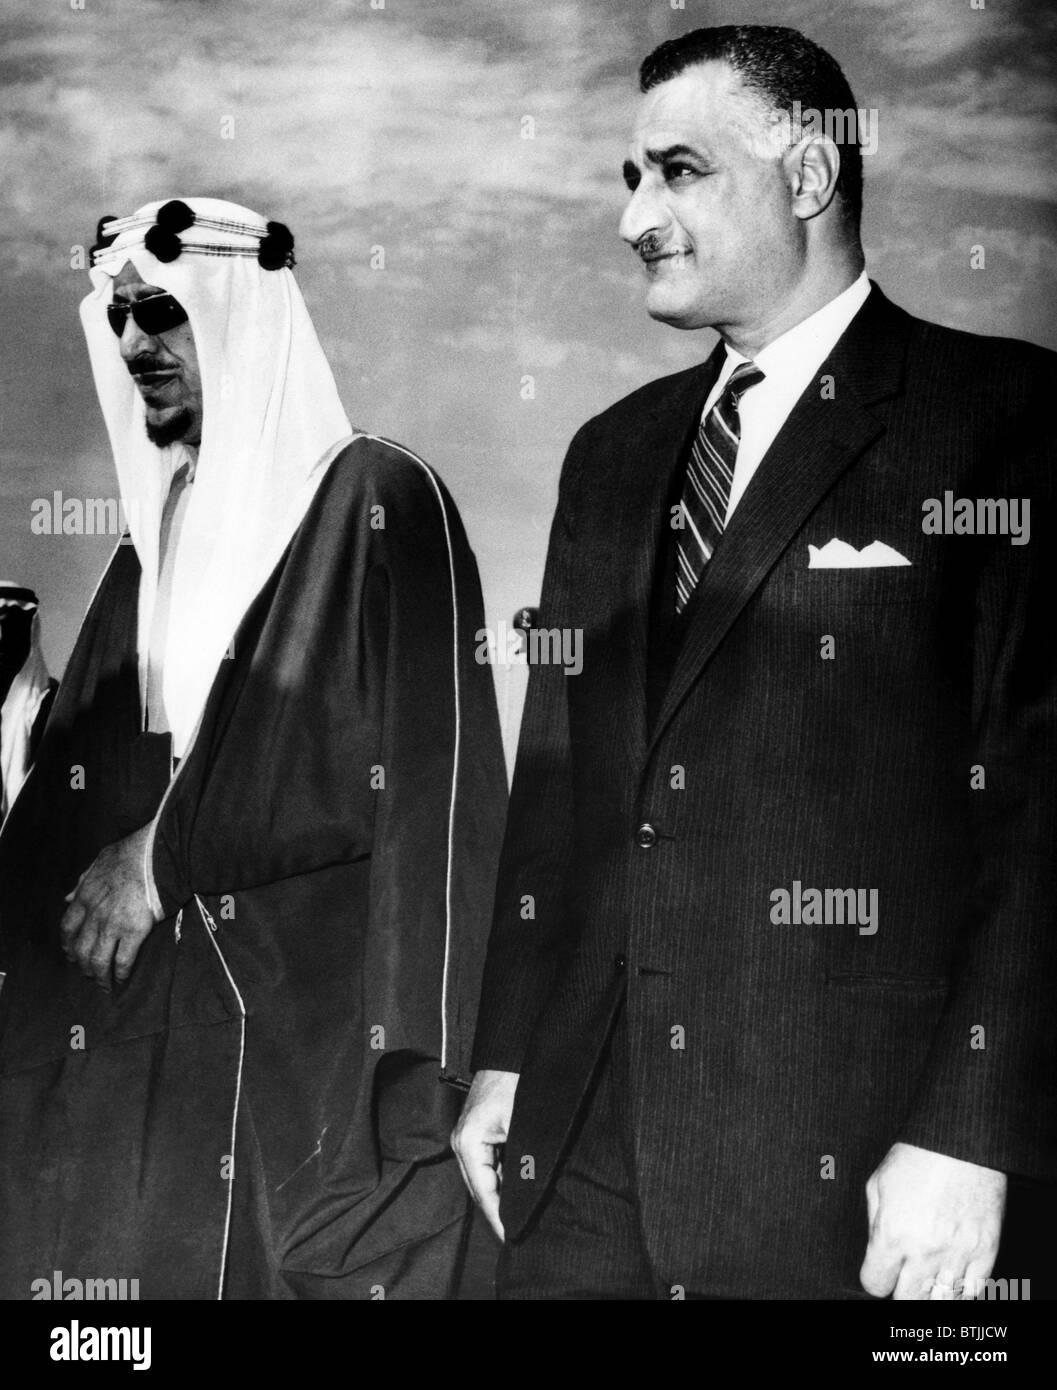 King Saud of Saudi Arabia, President of the United Arab Republic Gamal Abdel Nasser, meeting in Cairo, Egypt, 1964. - Stock Image